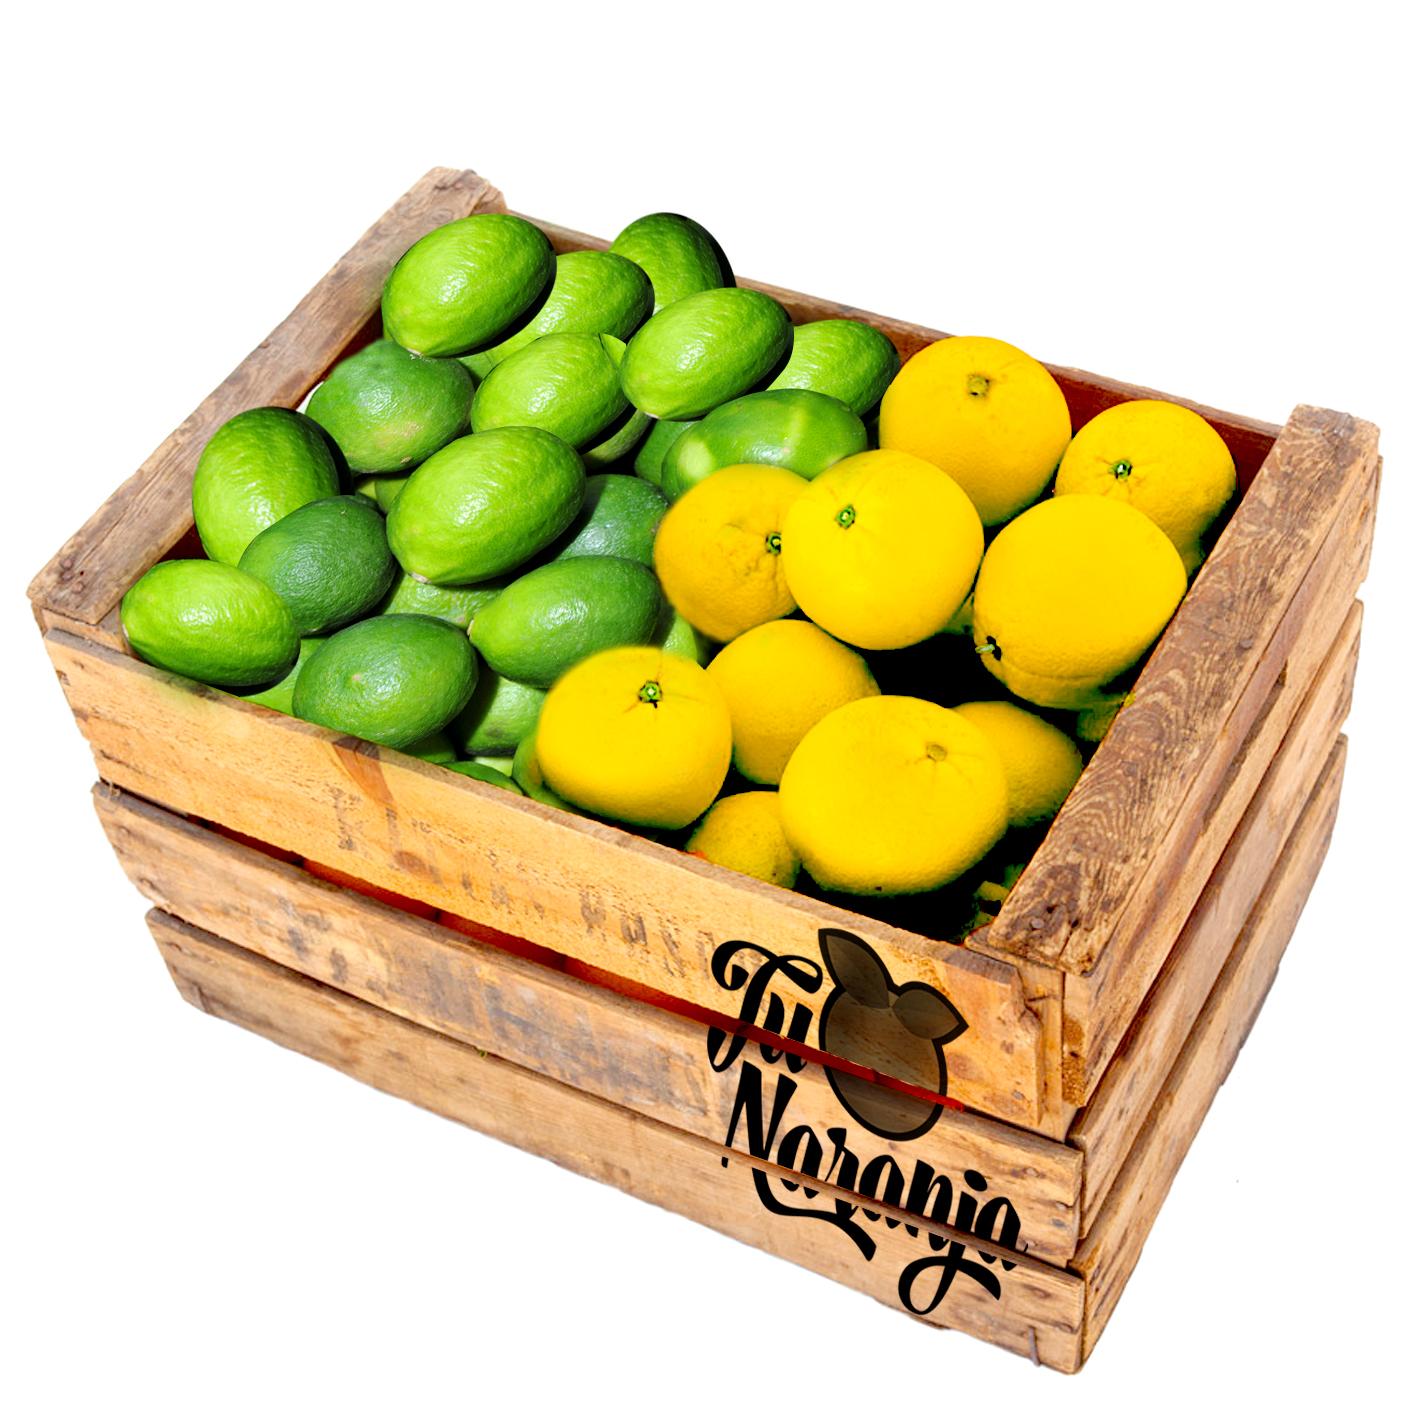 Naranja Sweety-Limón Tahiti (20kg Naranja / 3kg Limón)